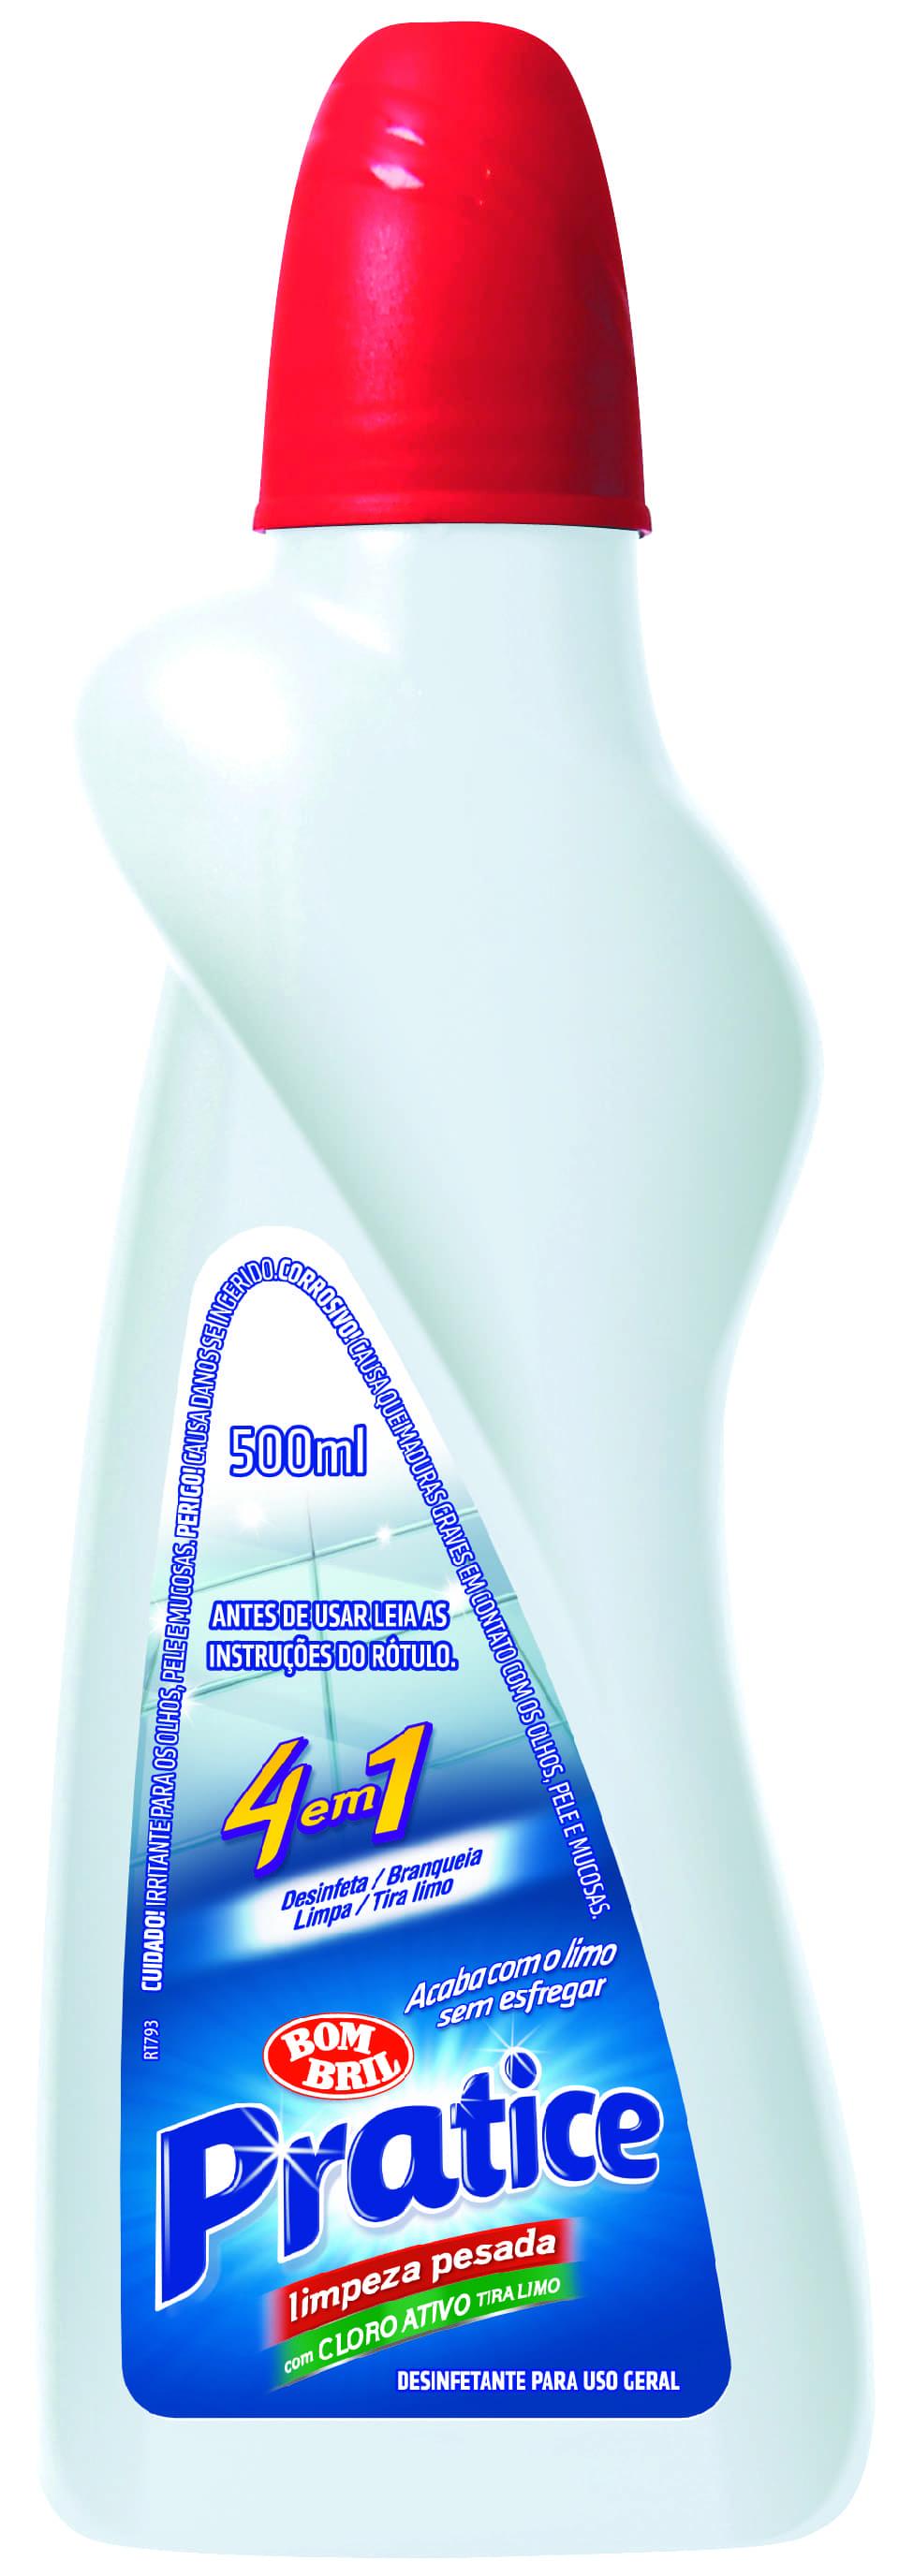 Pratice-Limpeza-Pesada-Cloro-Ativo